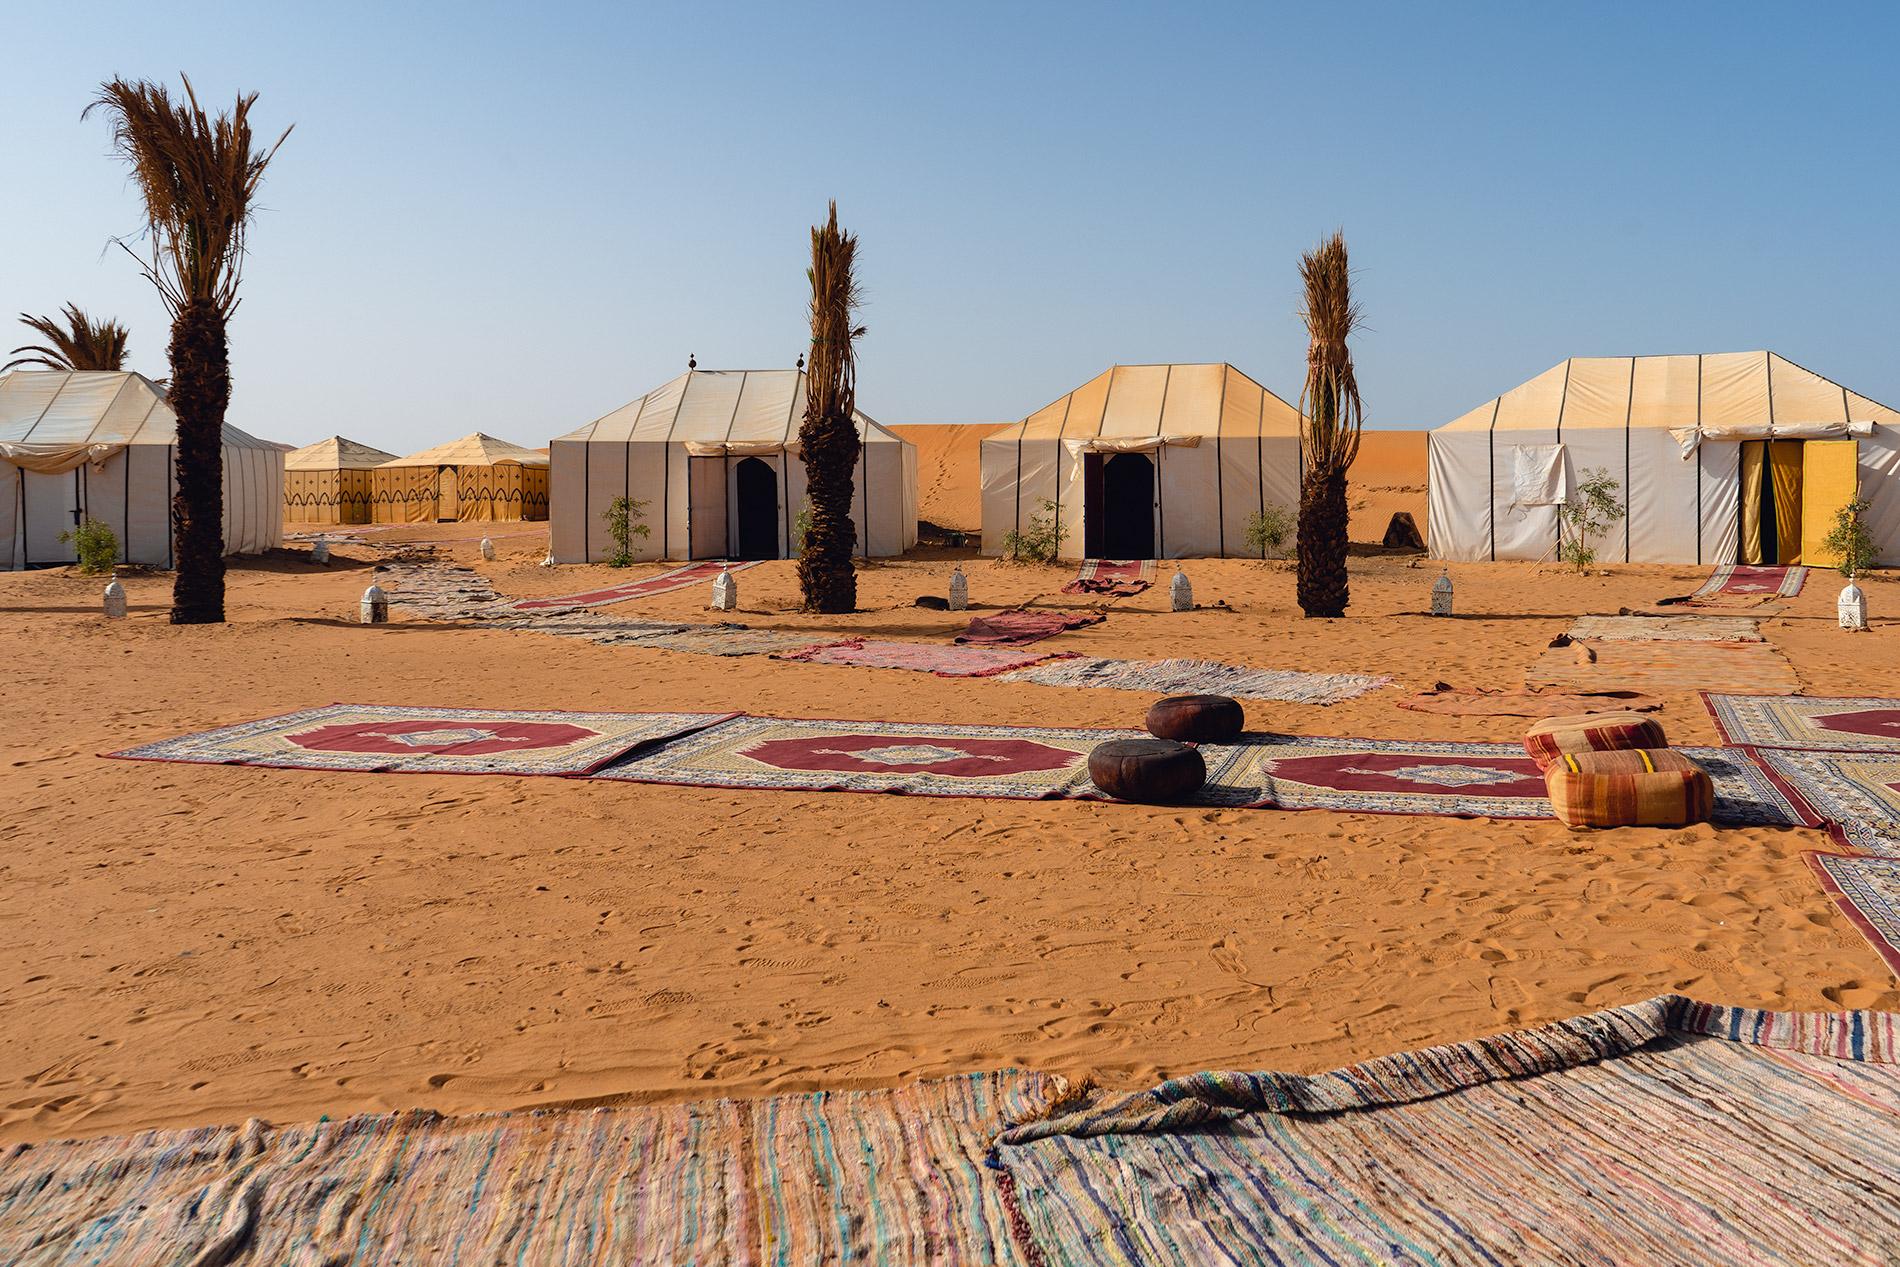 As tendas num acampamento de luxo no deserto em Marrocos